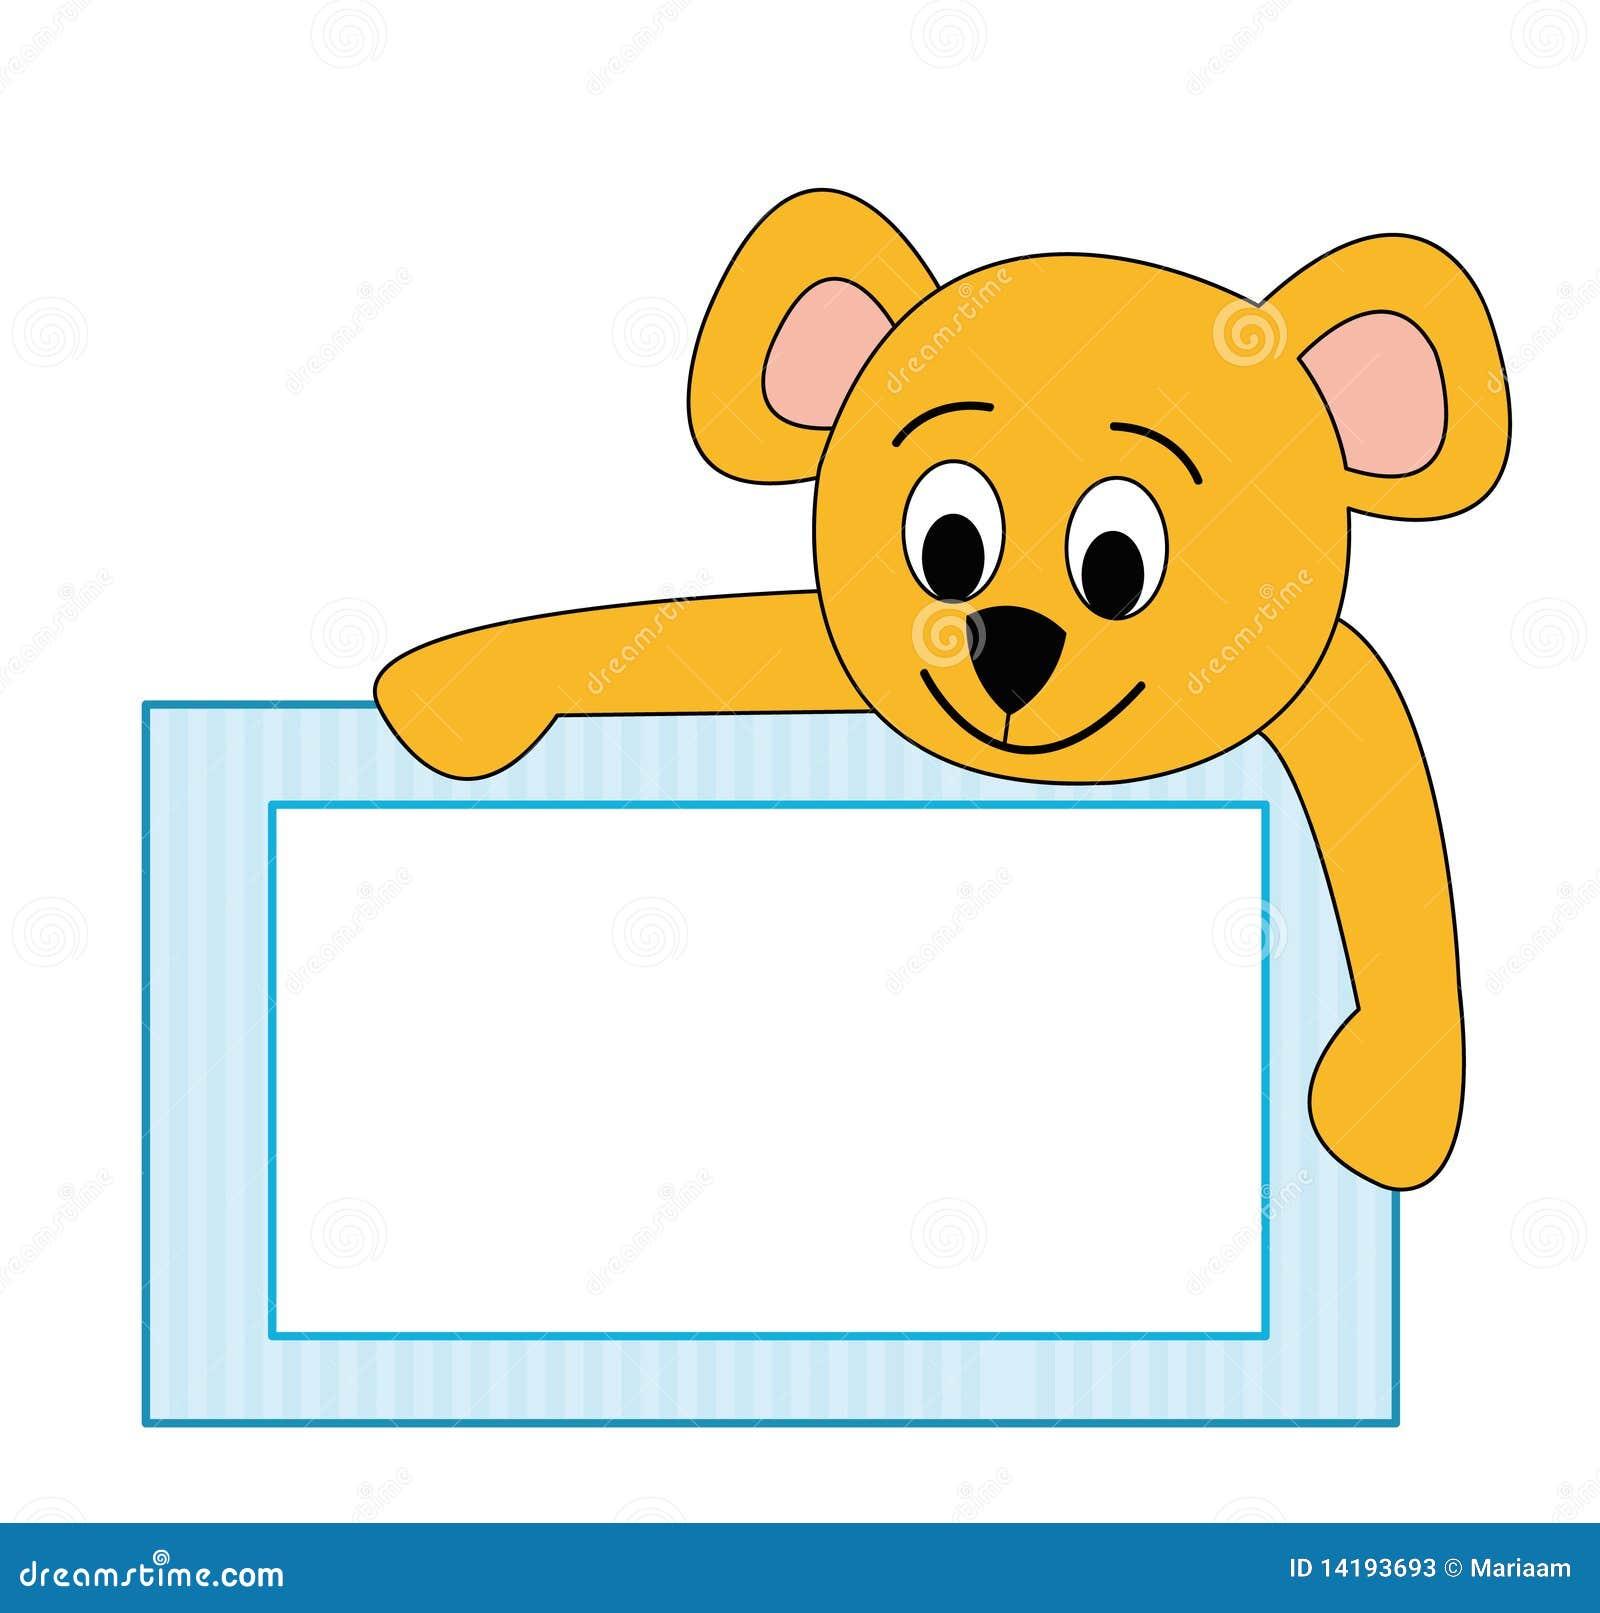 Frame With Teddy Bear Illustration 14193693 Megapixl